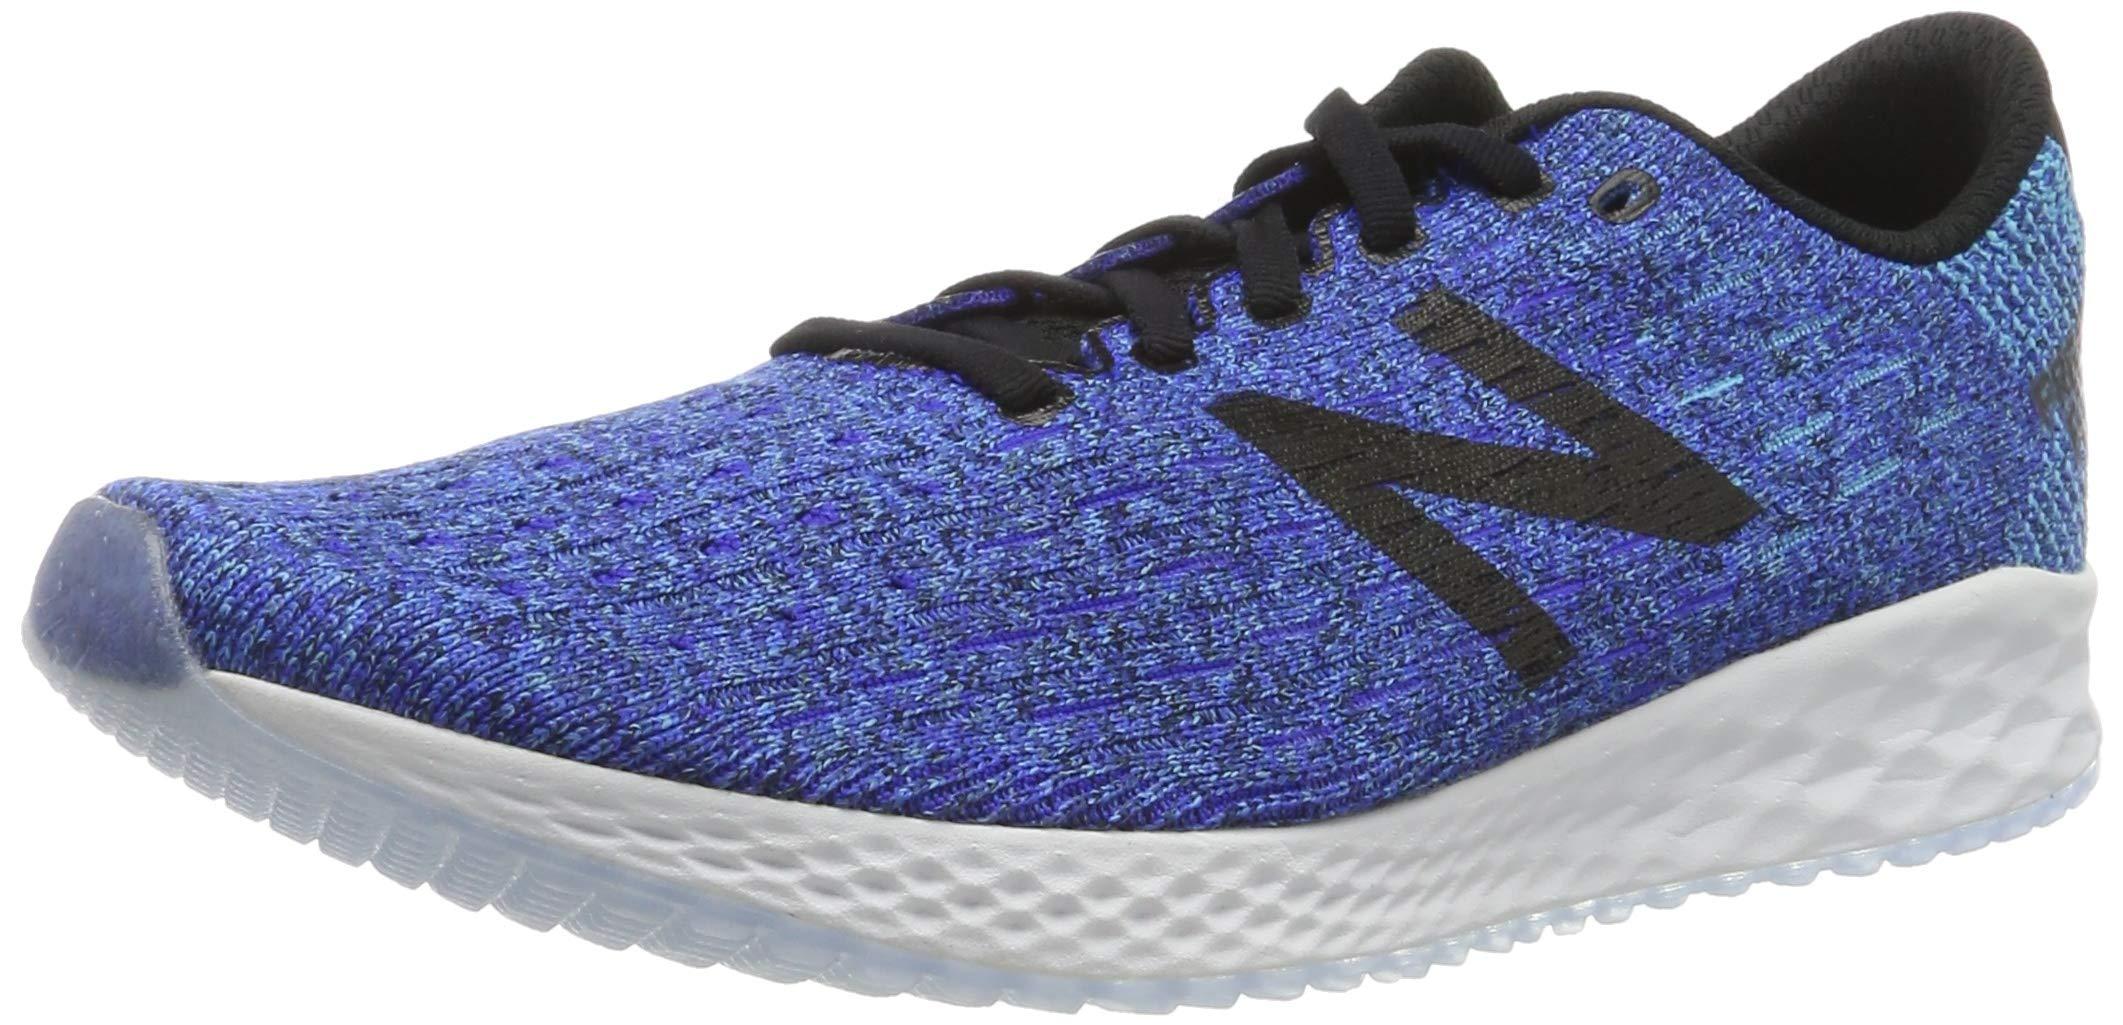 71%2B6KsPOYeL - New Balance Men's Zante Pursuit V1 Fresh Foam Running Shoe